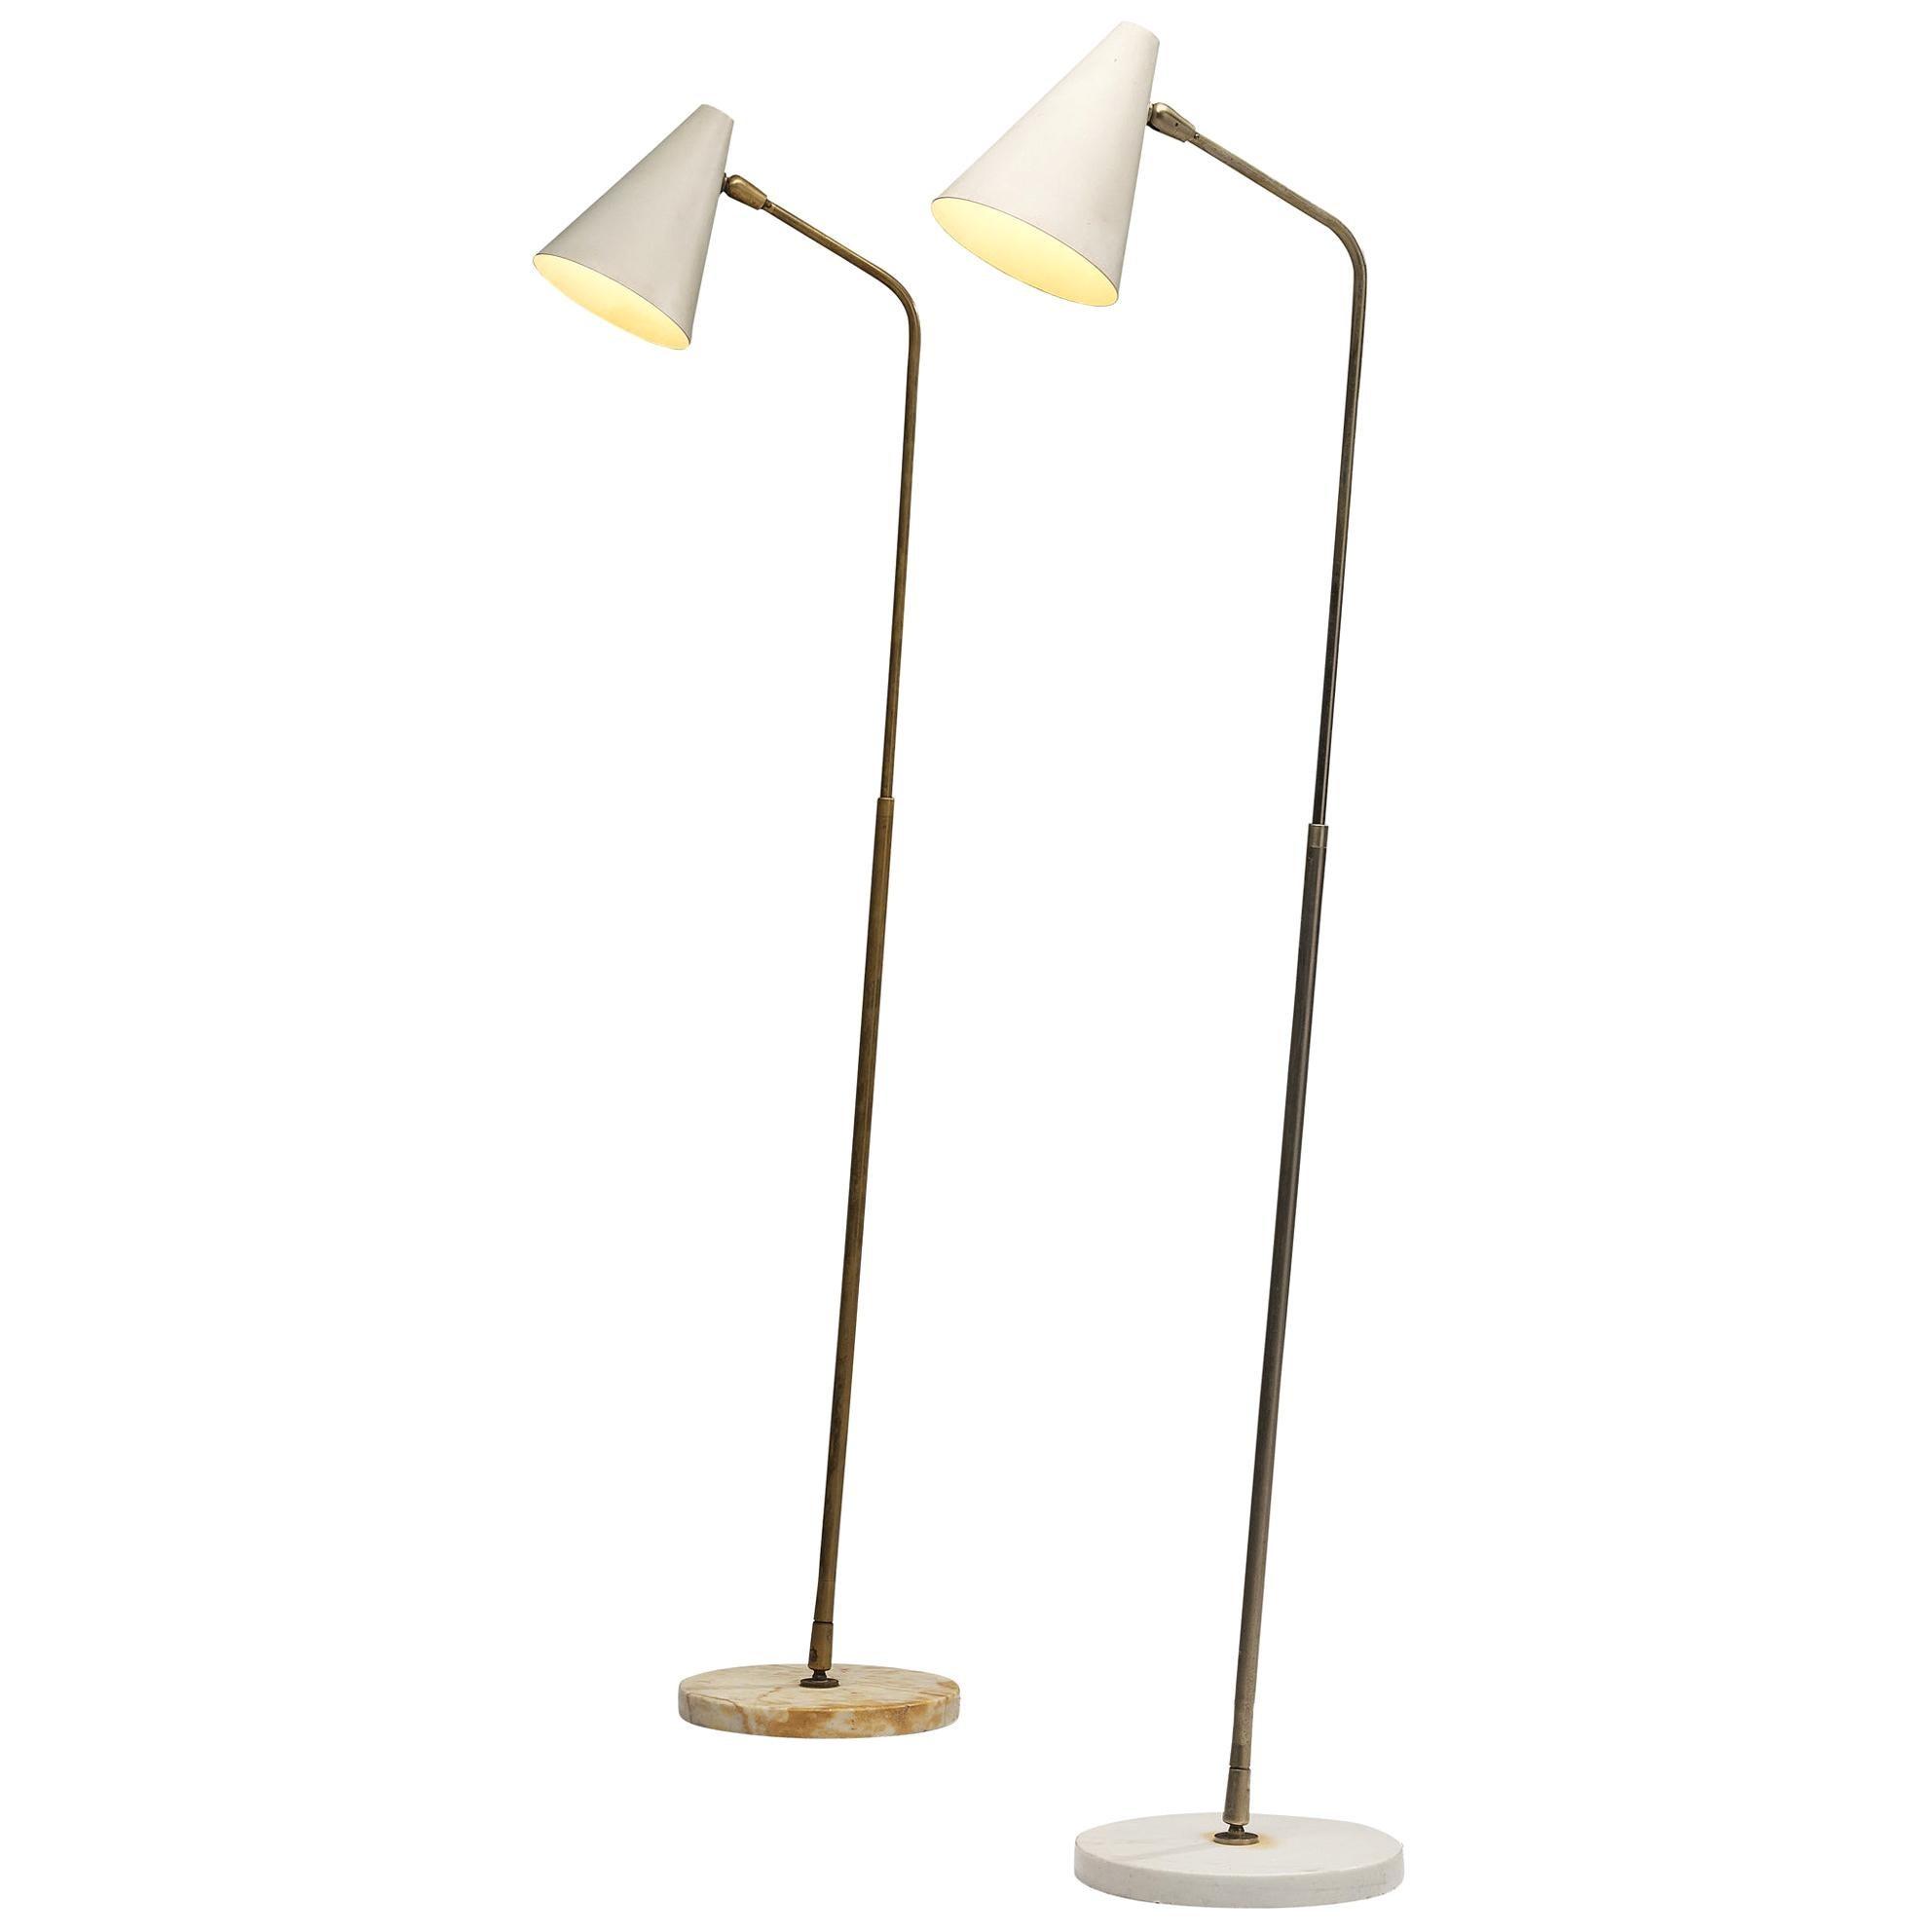 Giuseppe Ostuni Adjustable Floor Lamps in Marble and Metal